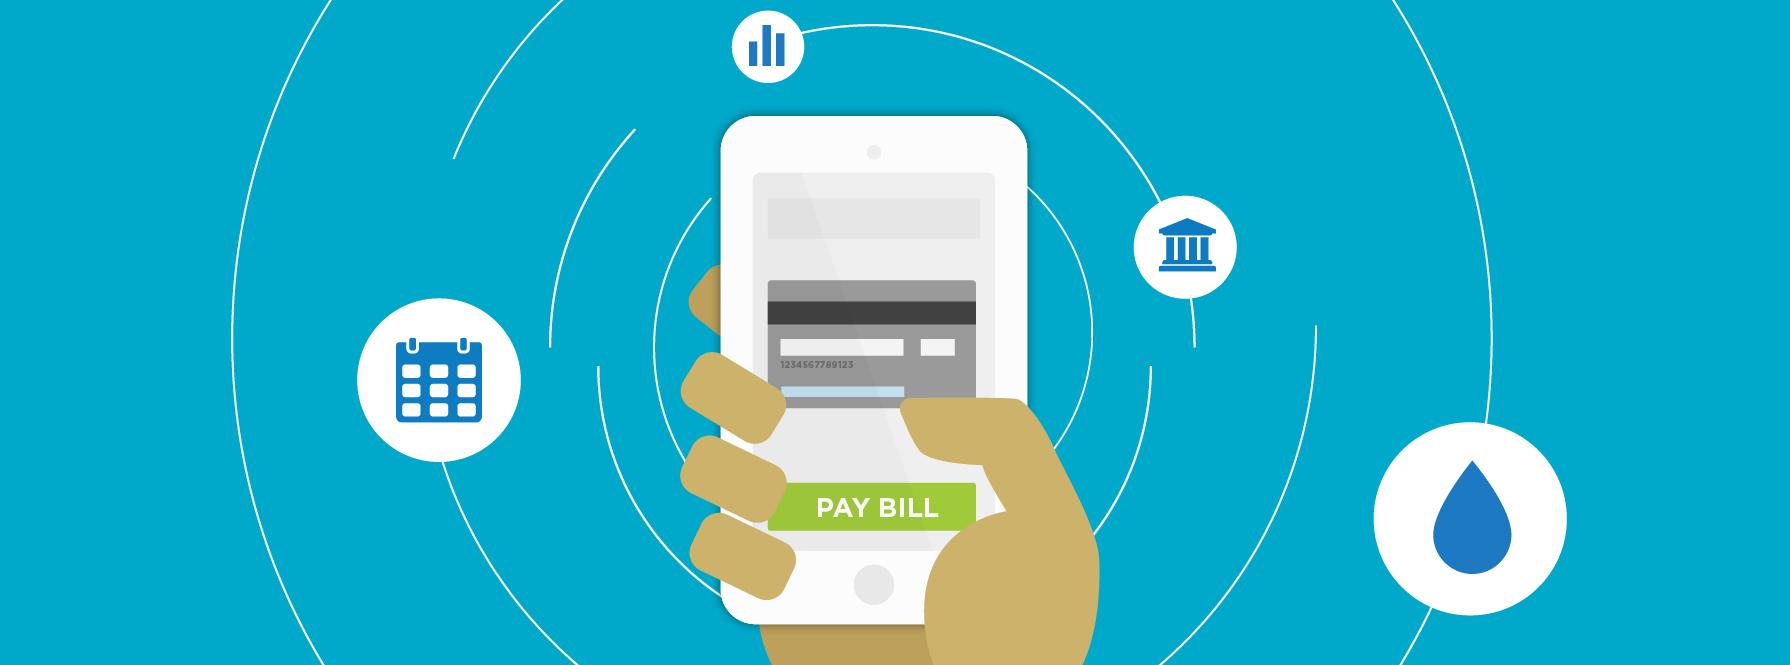 deconstructing payment performance